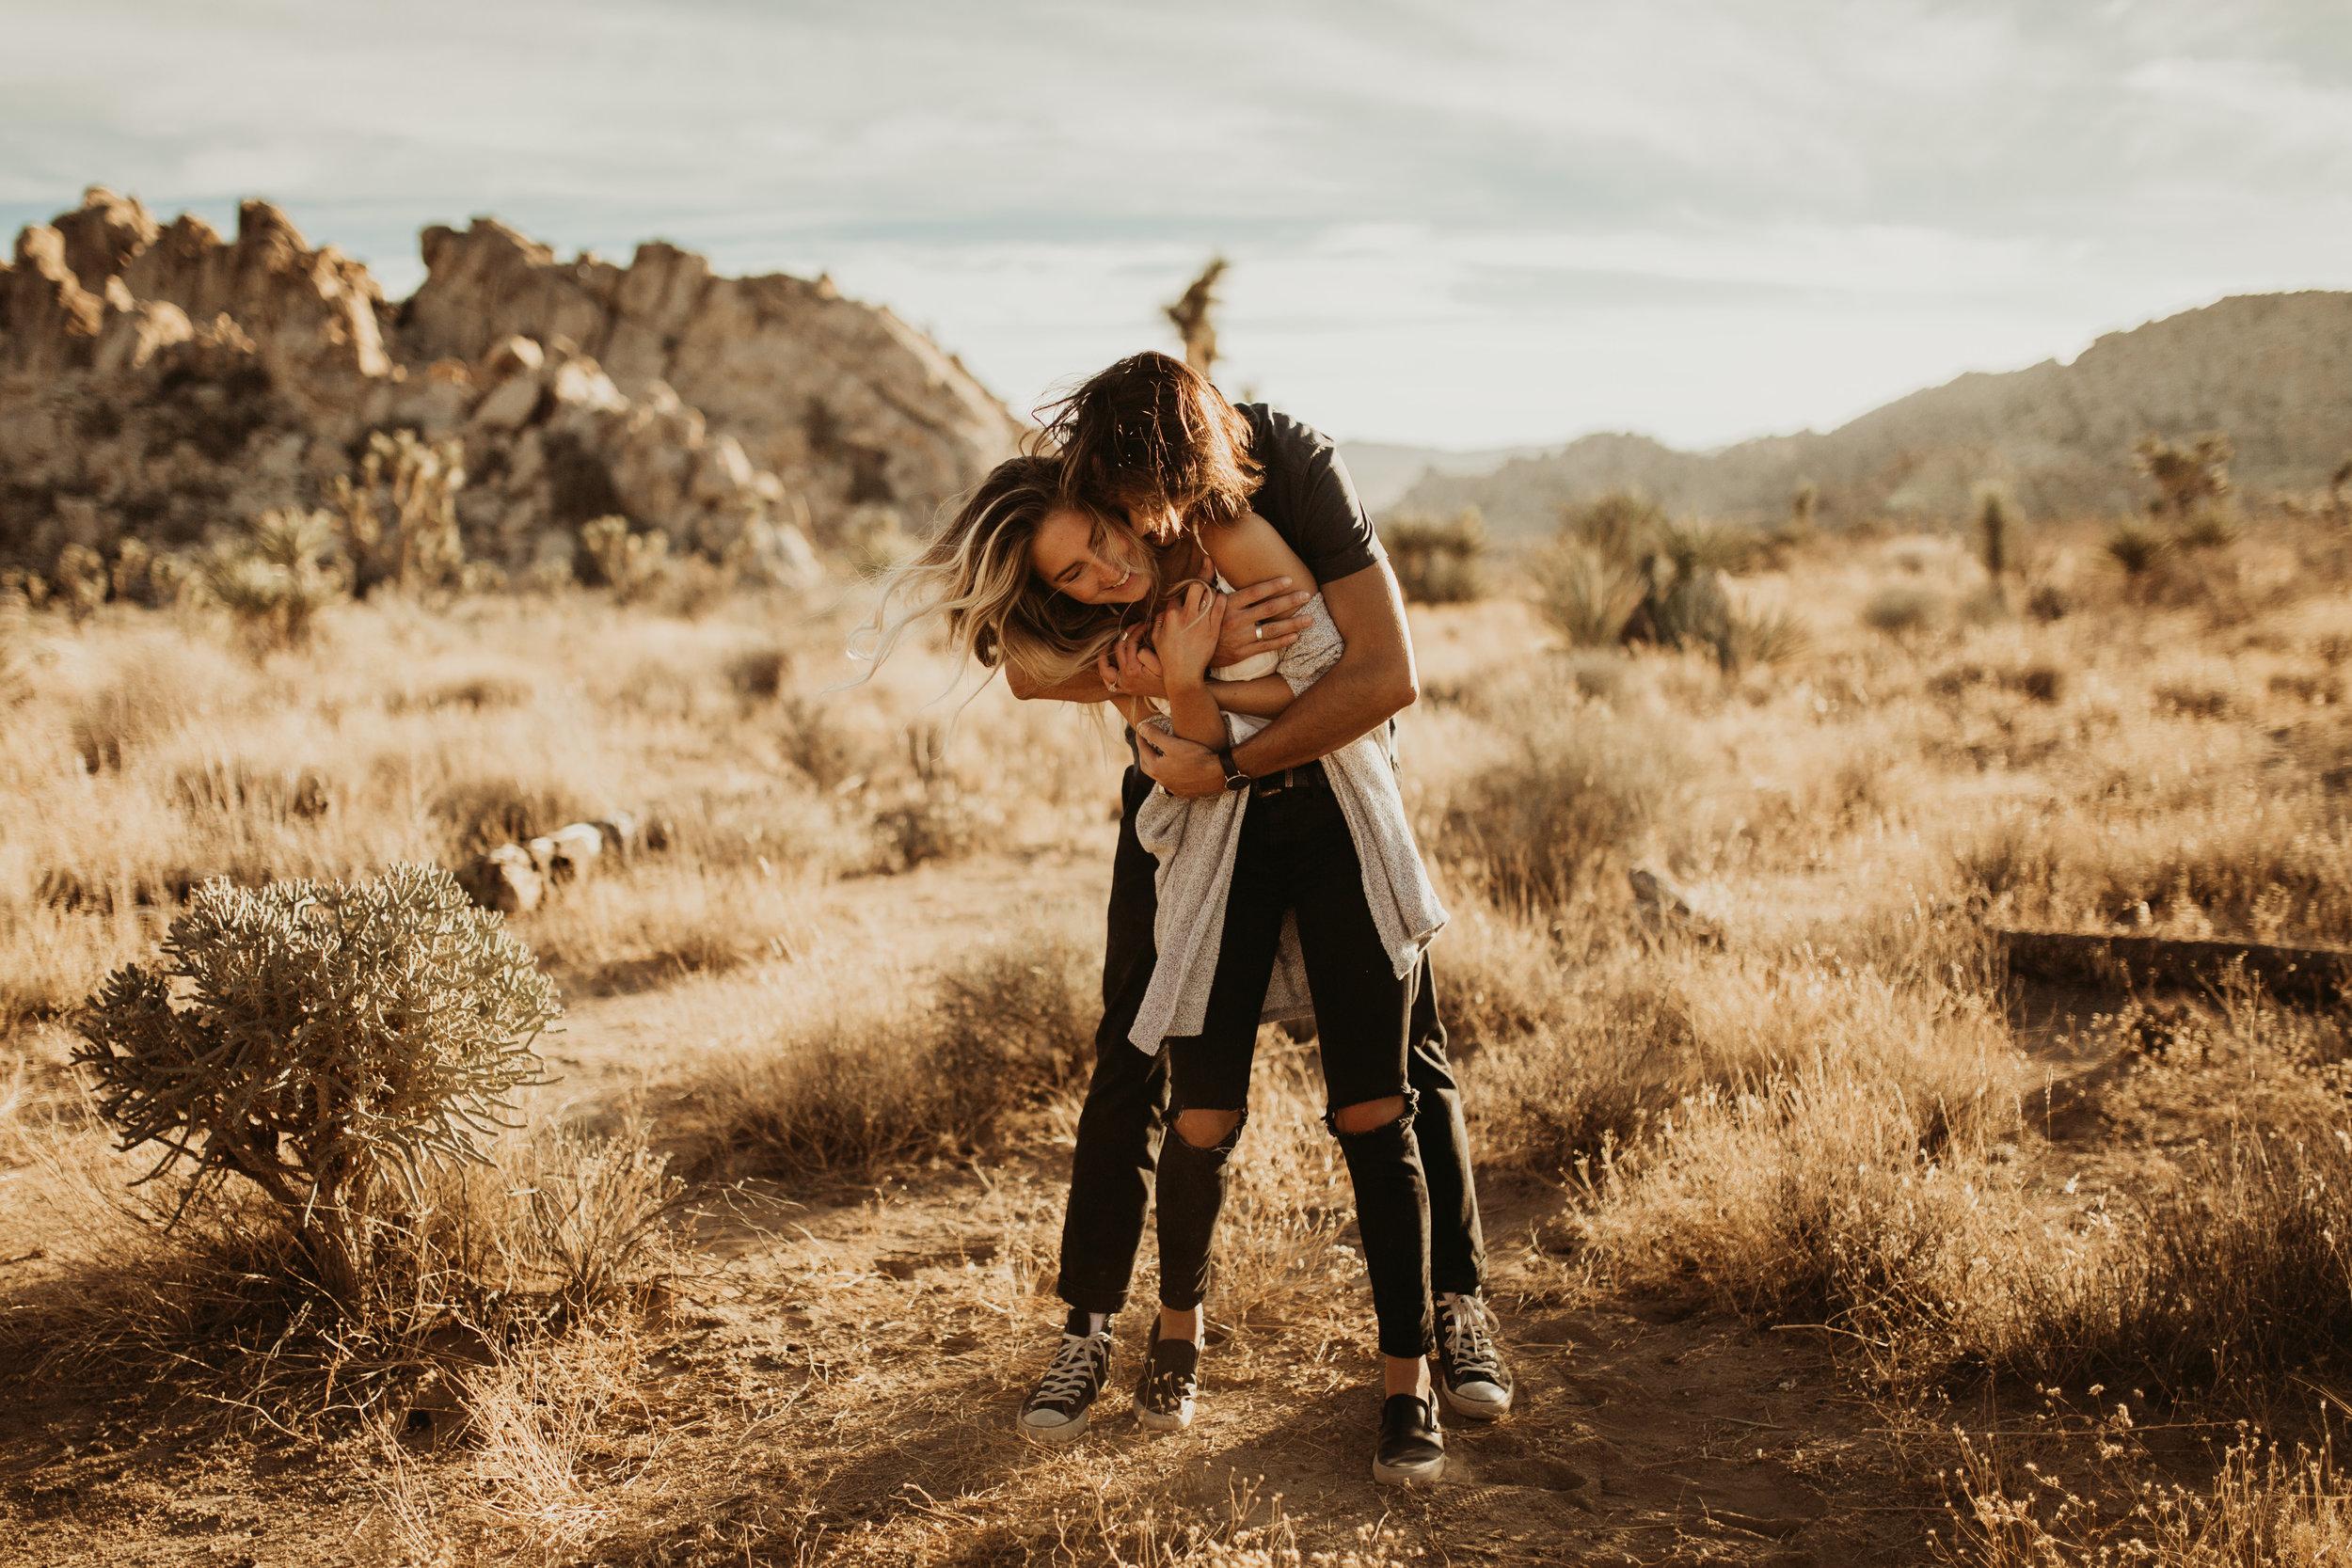 joshuatree+california+arizona+wedding+elopement+photographer06.jpg